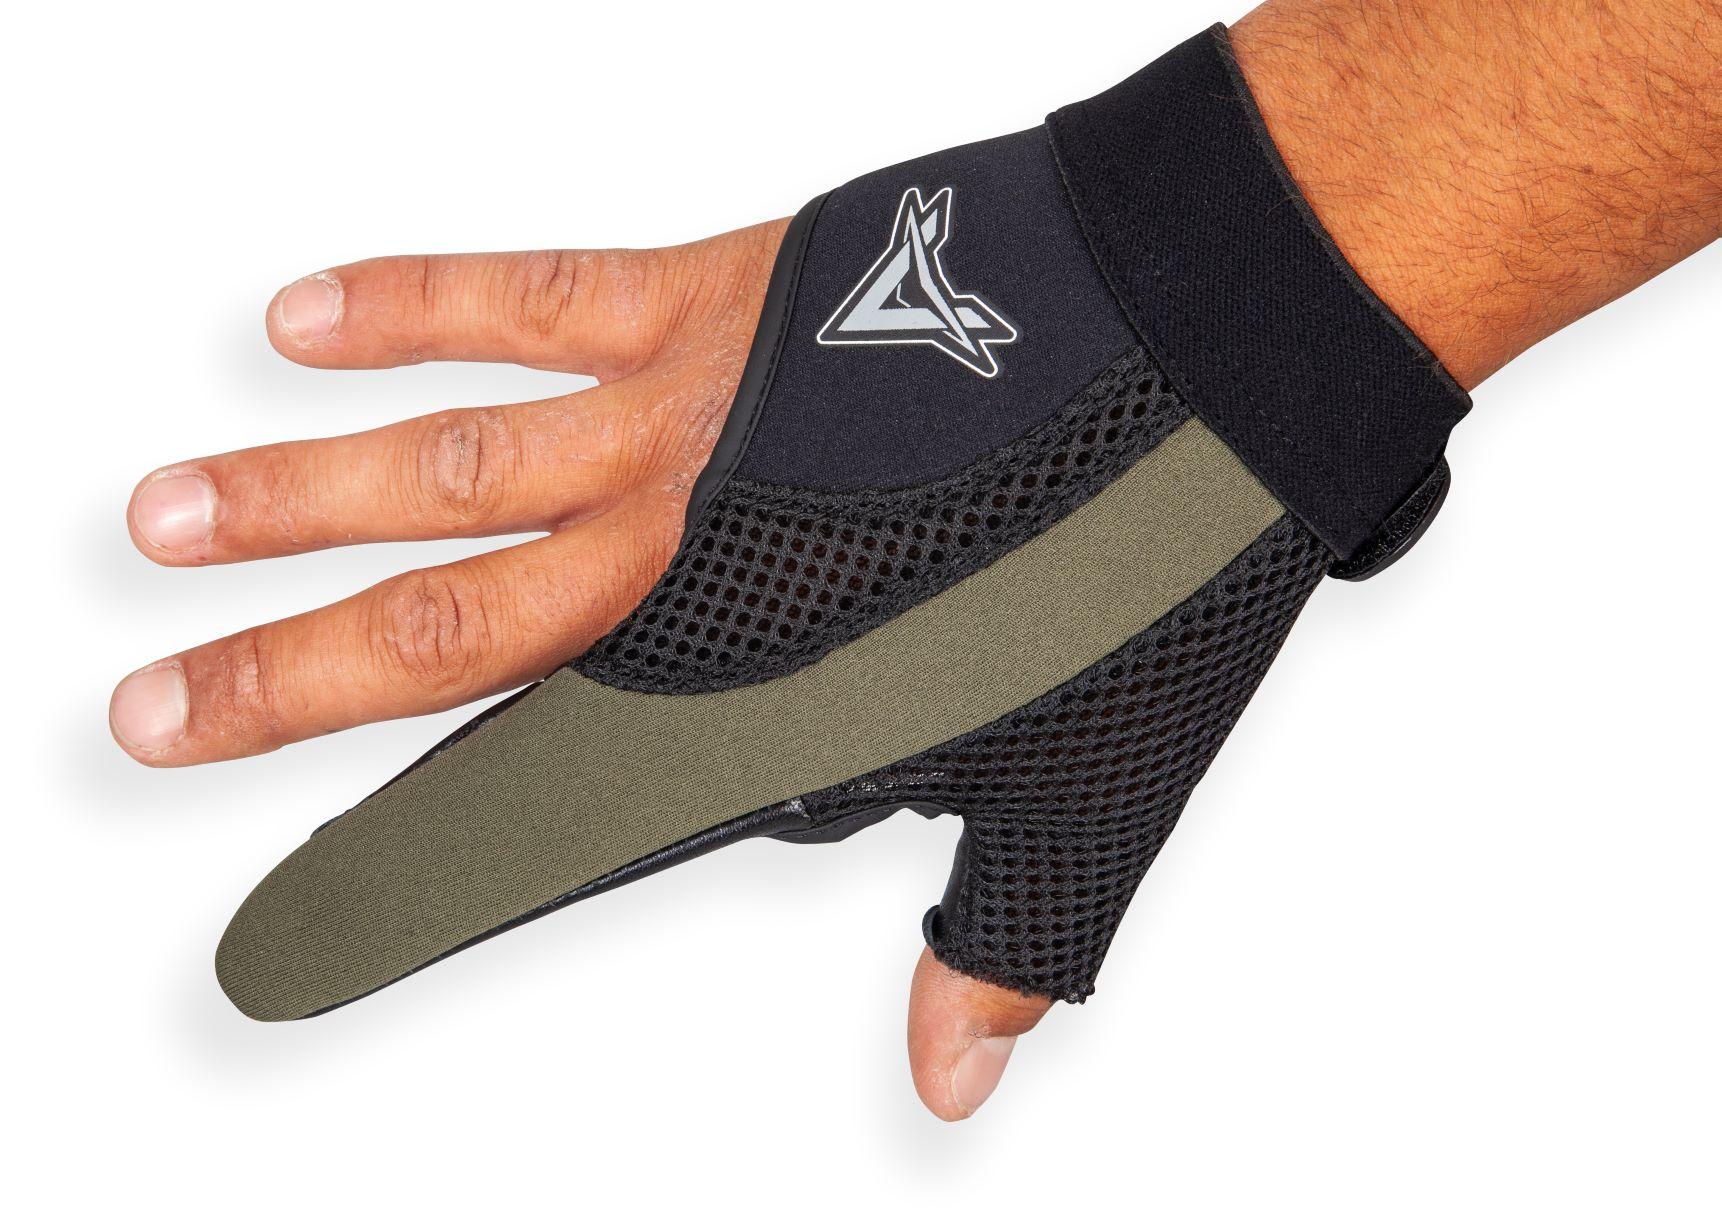 Anaconda rukavice Profi Casting Glove, pravá, vel. XL